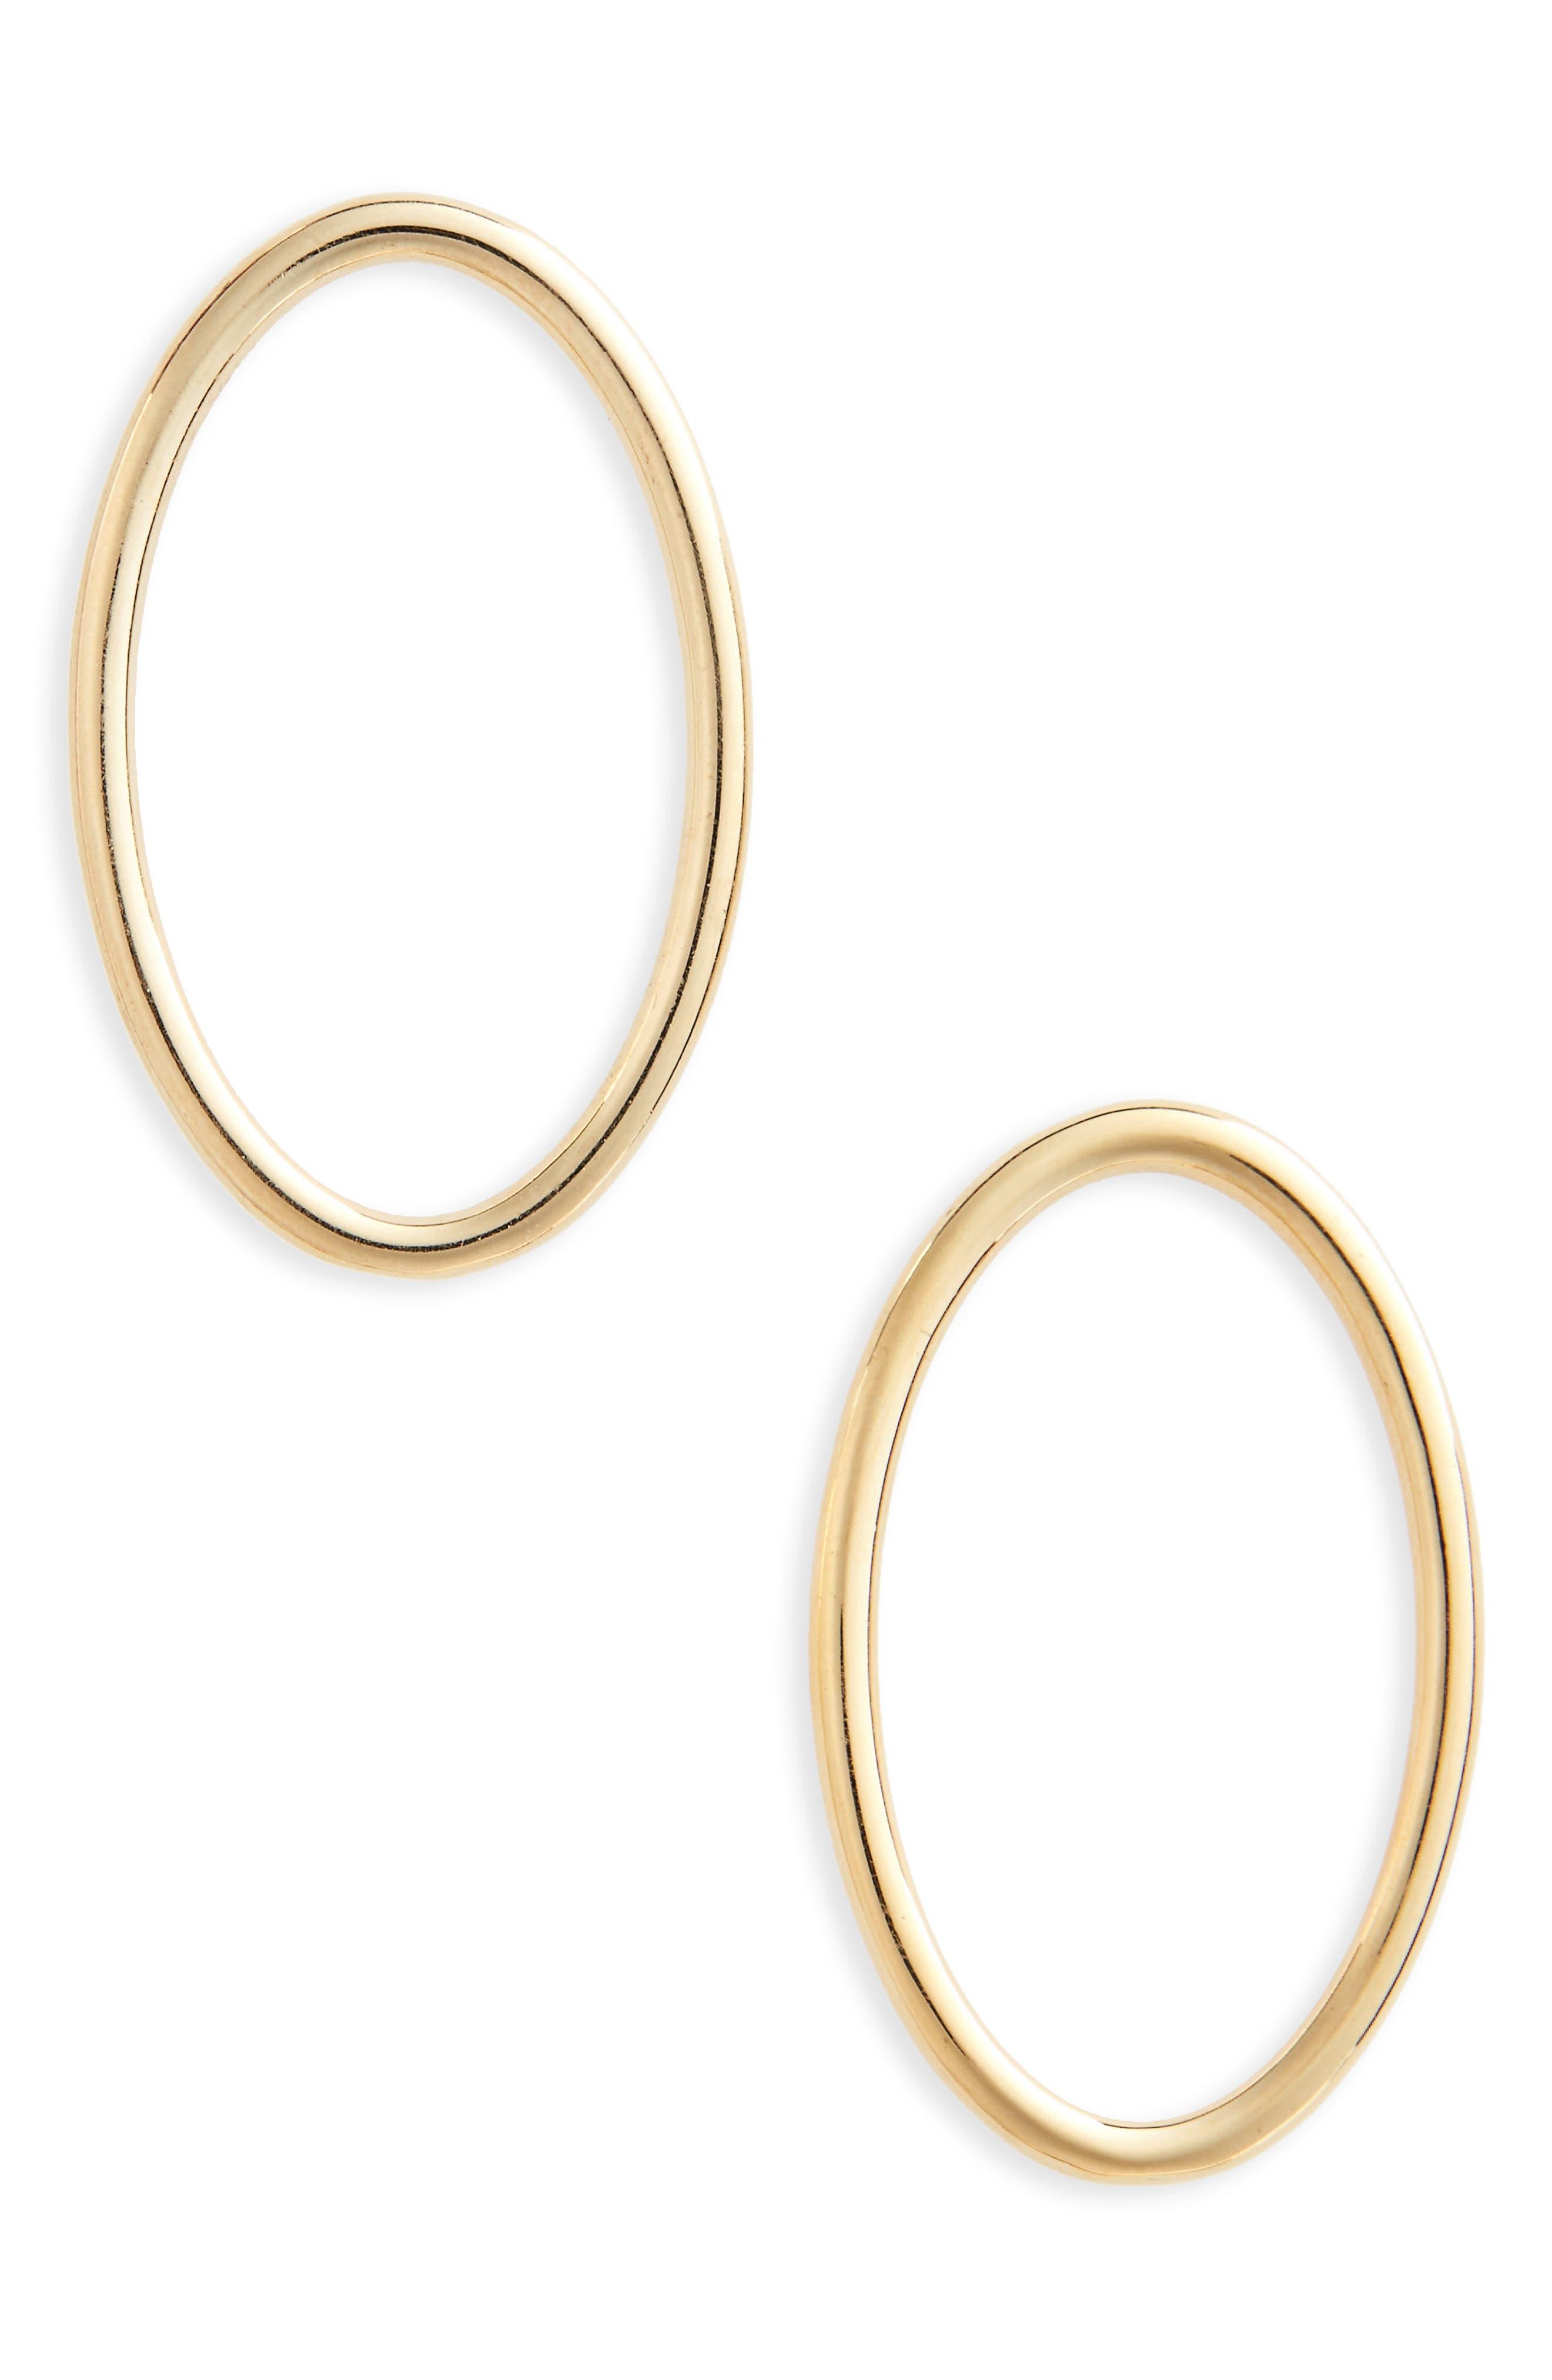 Large Ellipse Polished Vermeil Earrings,                             Main thumbnail 1, color,                             POLISHED VERMEIL